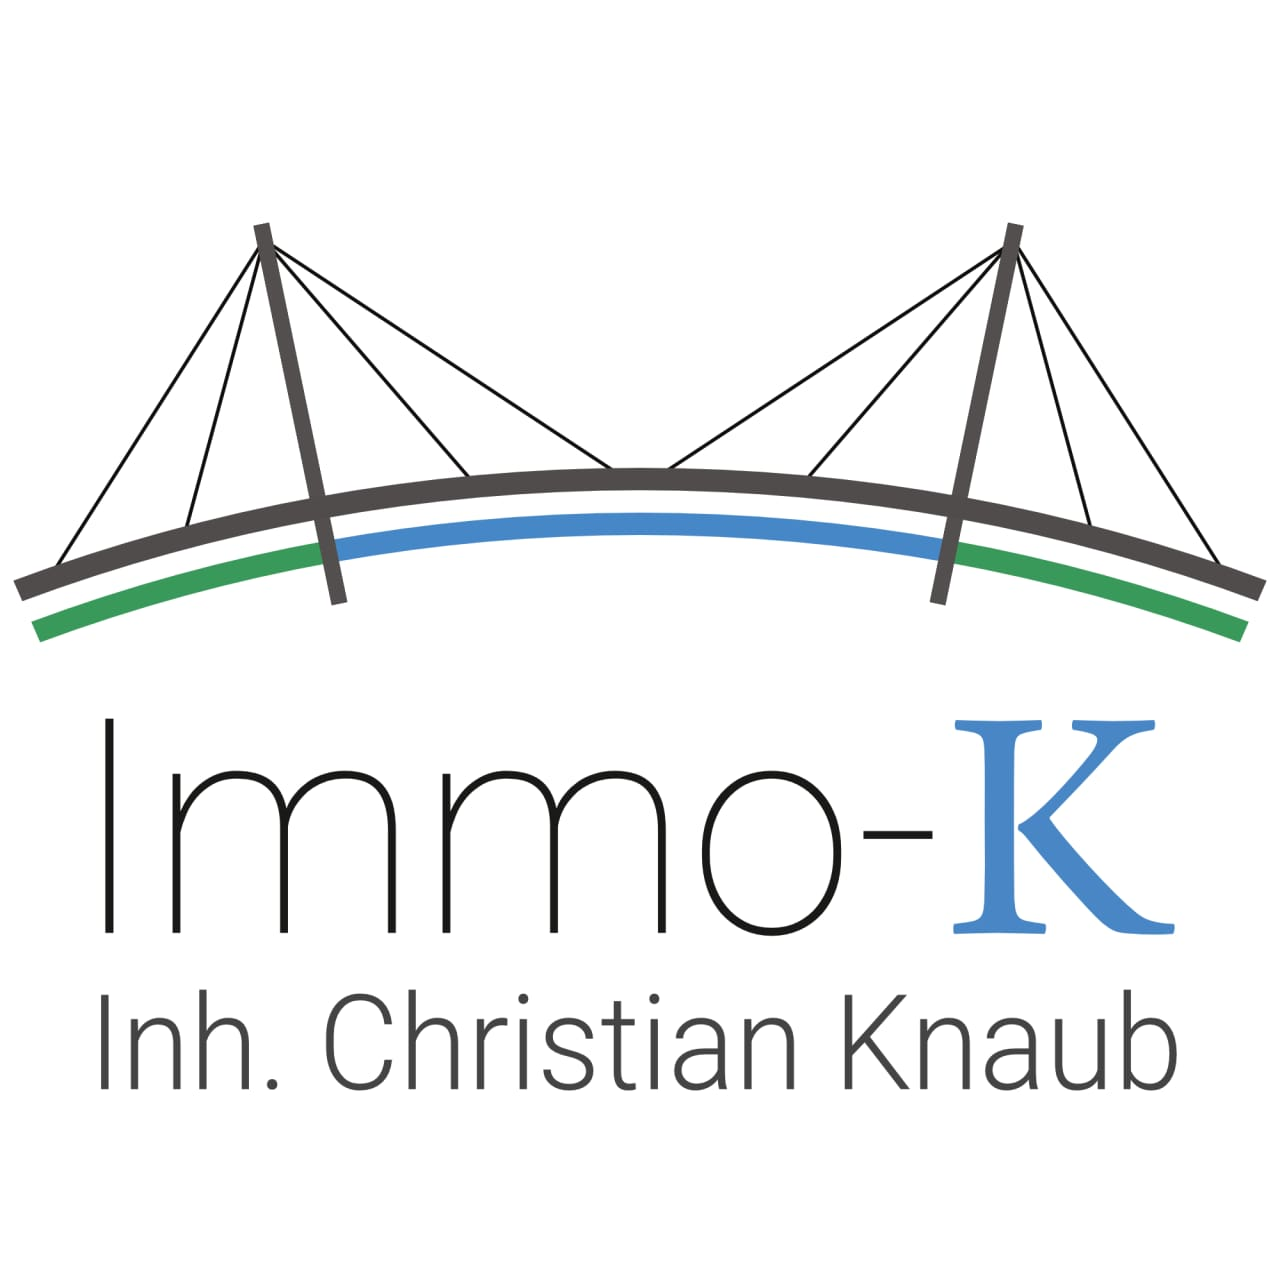 Logo Immo-K Makler in Kehl, Straßburg und Umgebung